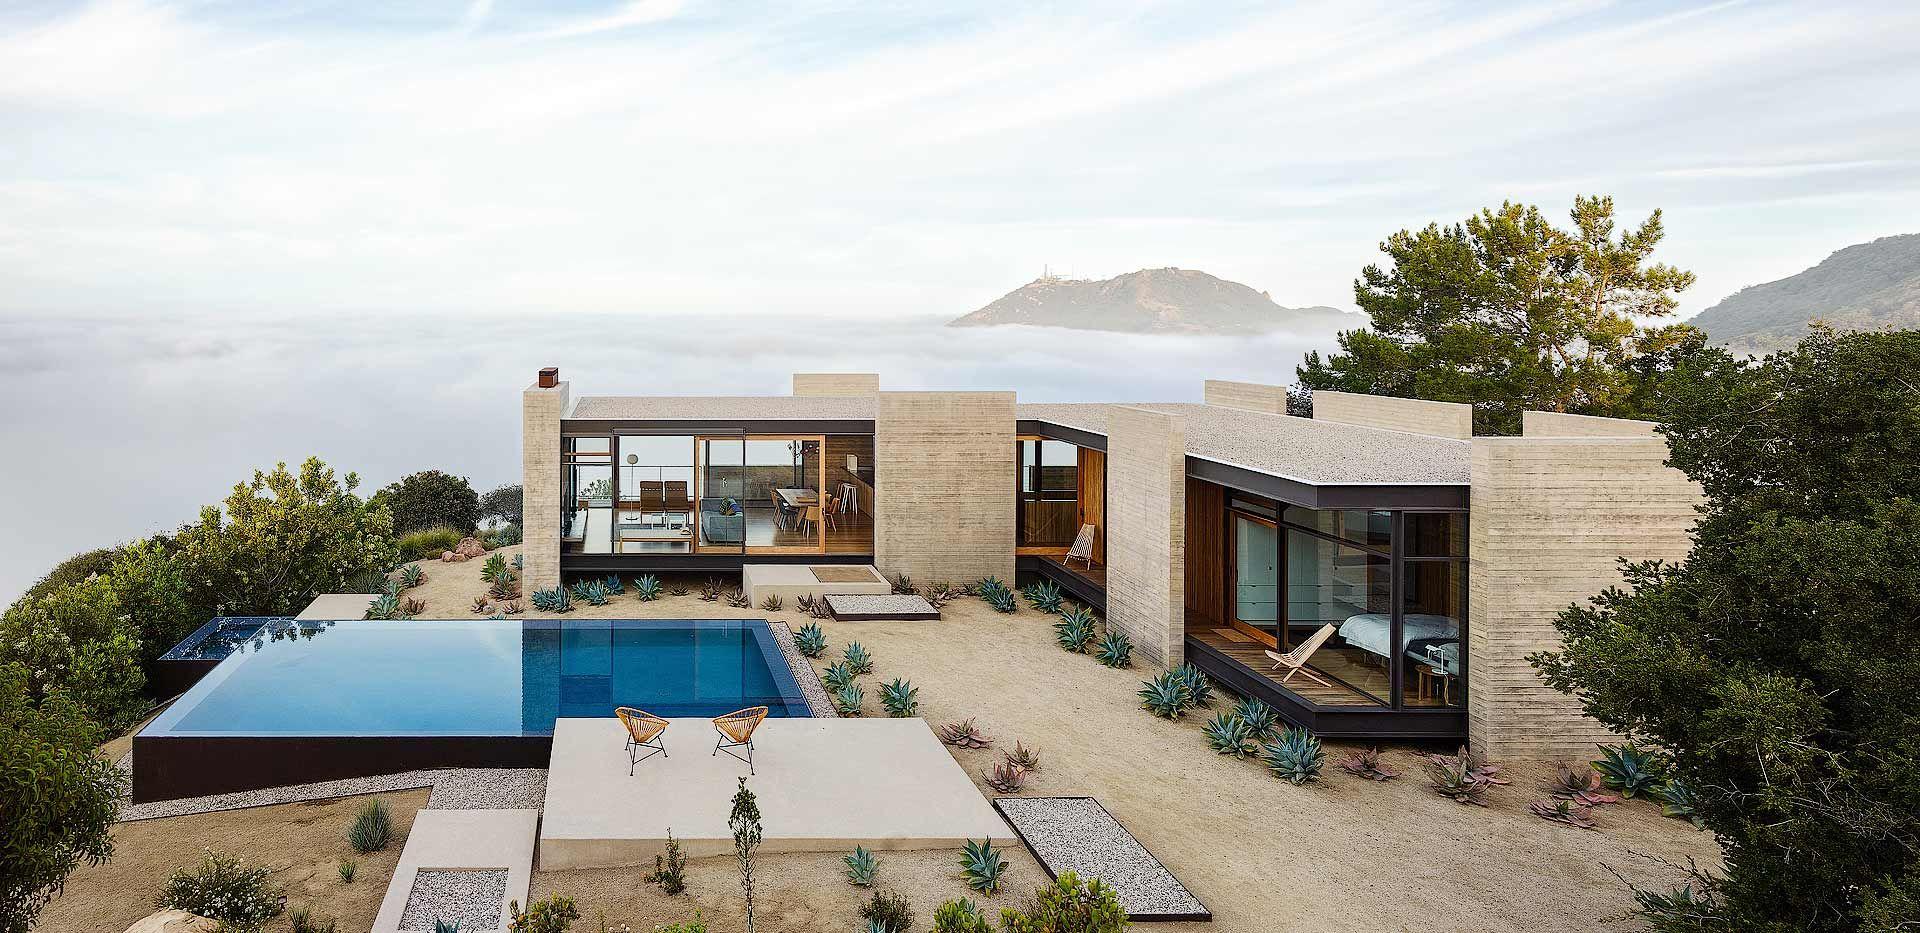 Saddle Peak House In California United States Villa Rentals In 2020 Architecture House Architecture California Homes